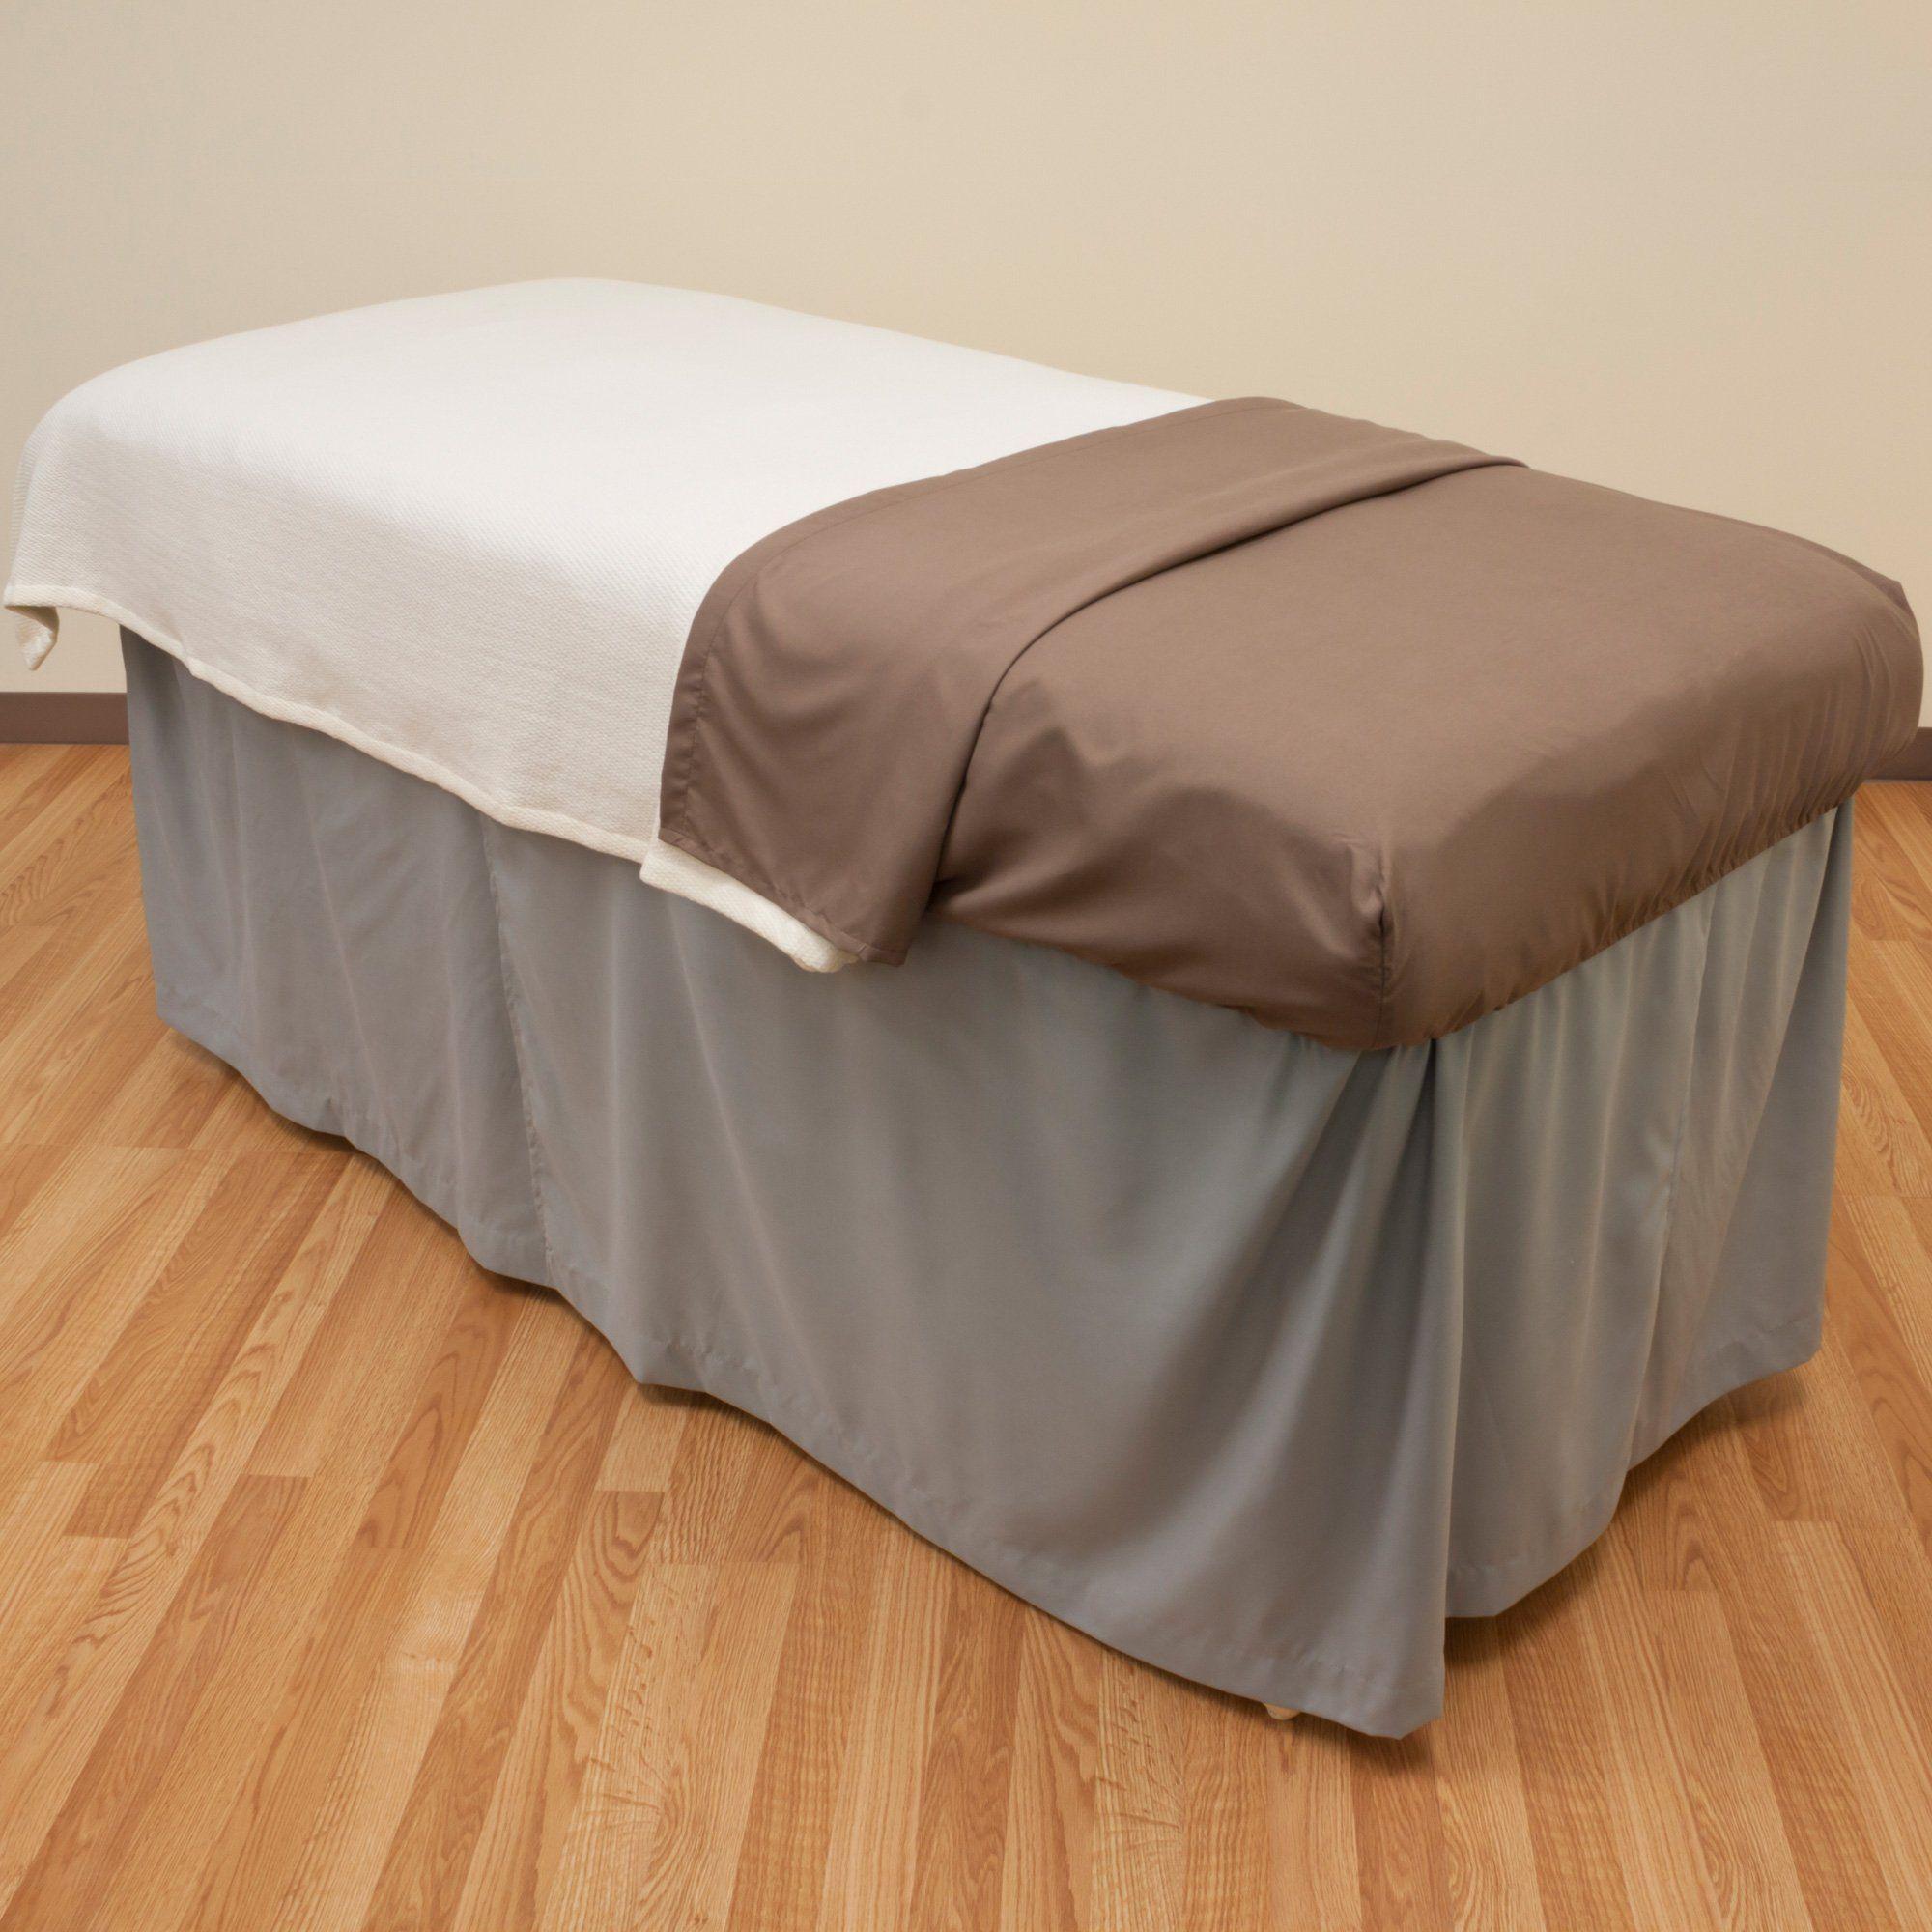 Microfiber Massage Table Skirt Walnut Brown from Body